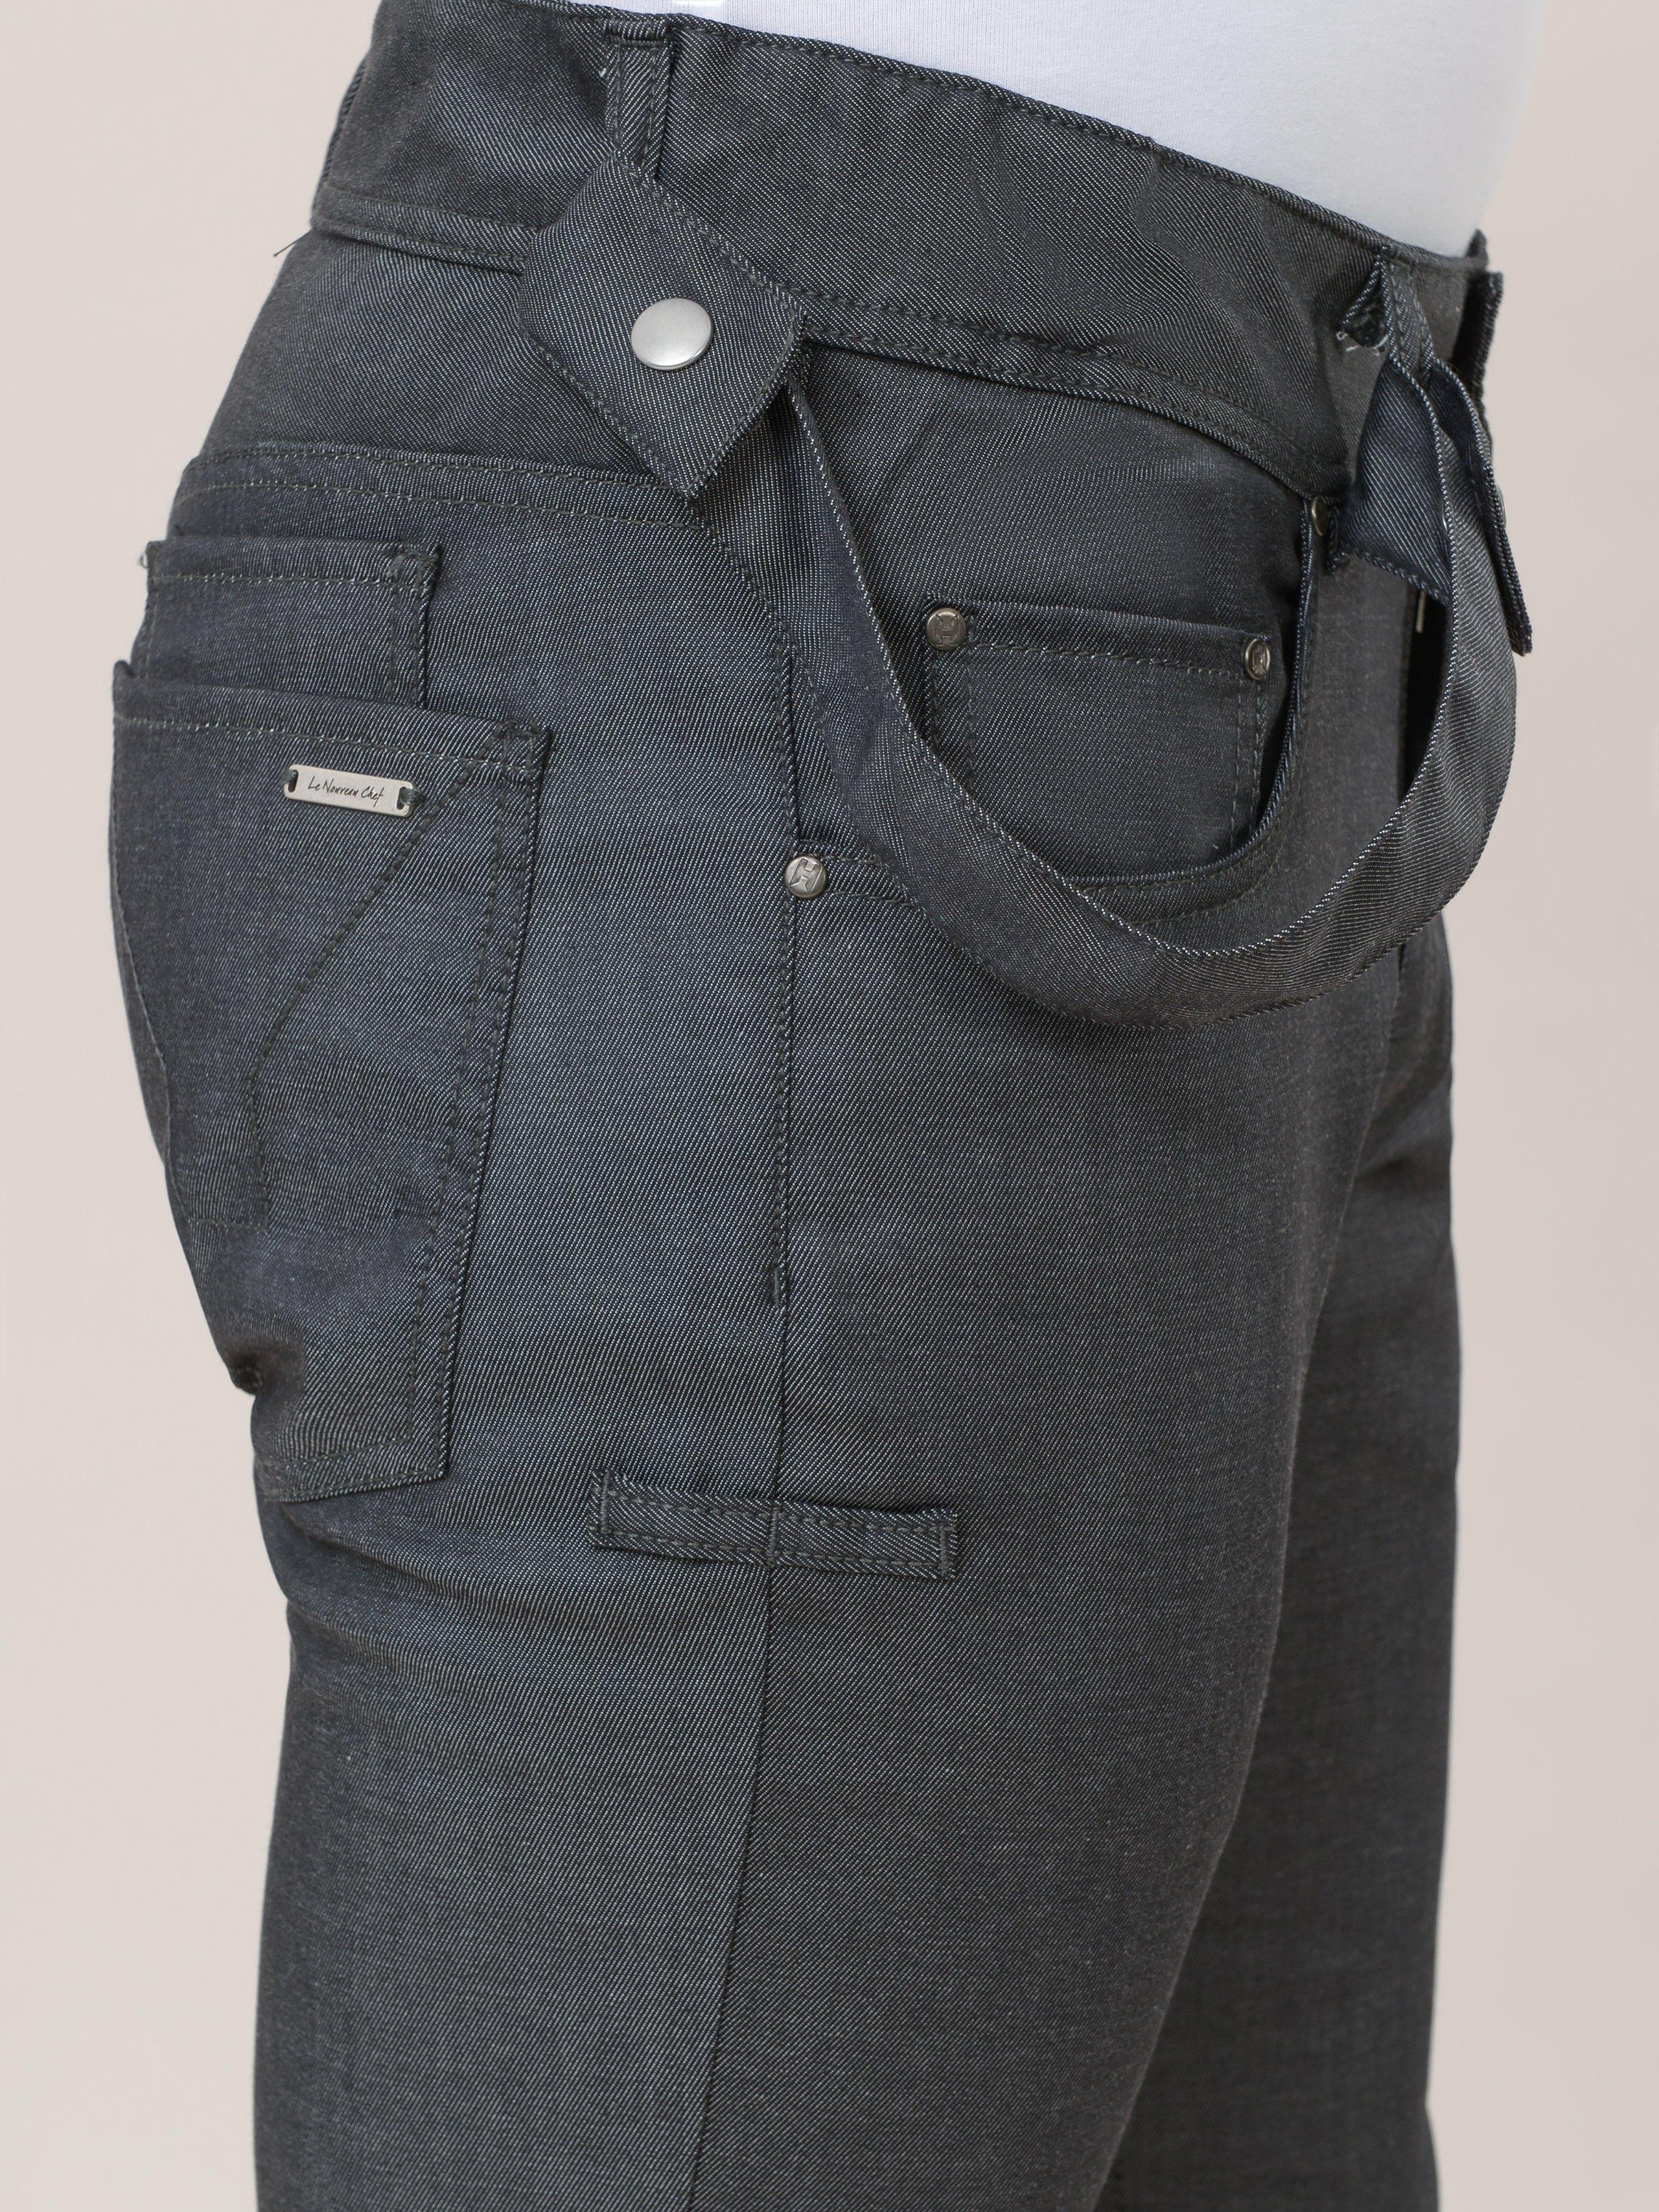 Pants Chicago Black Denim